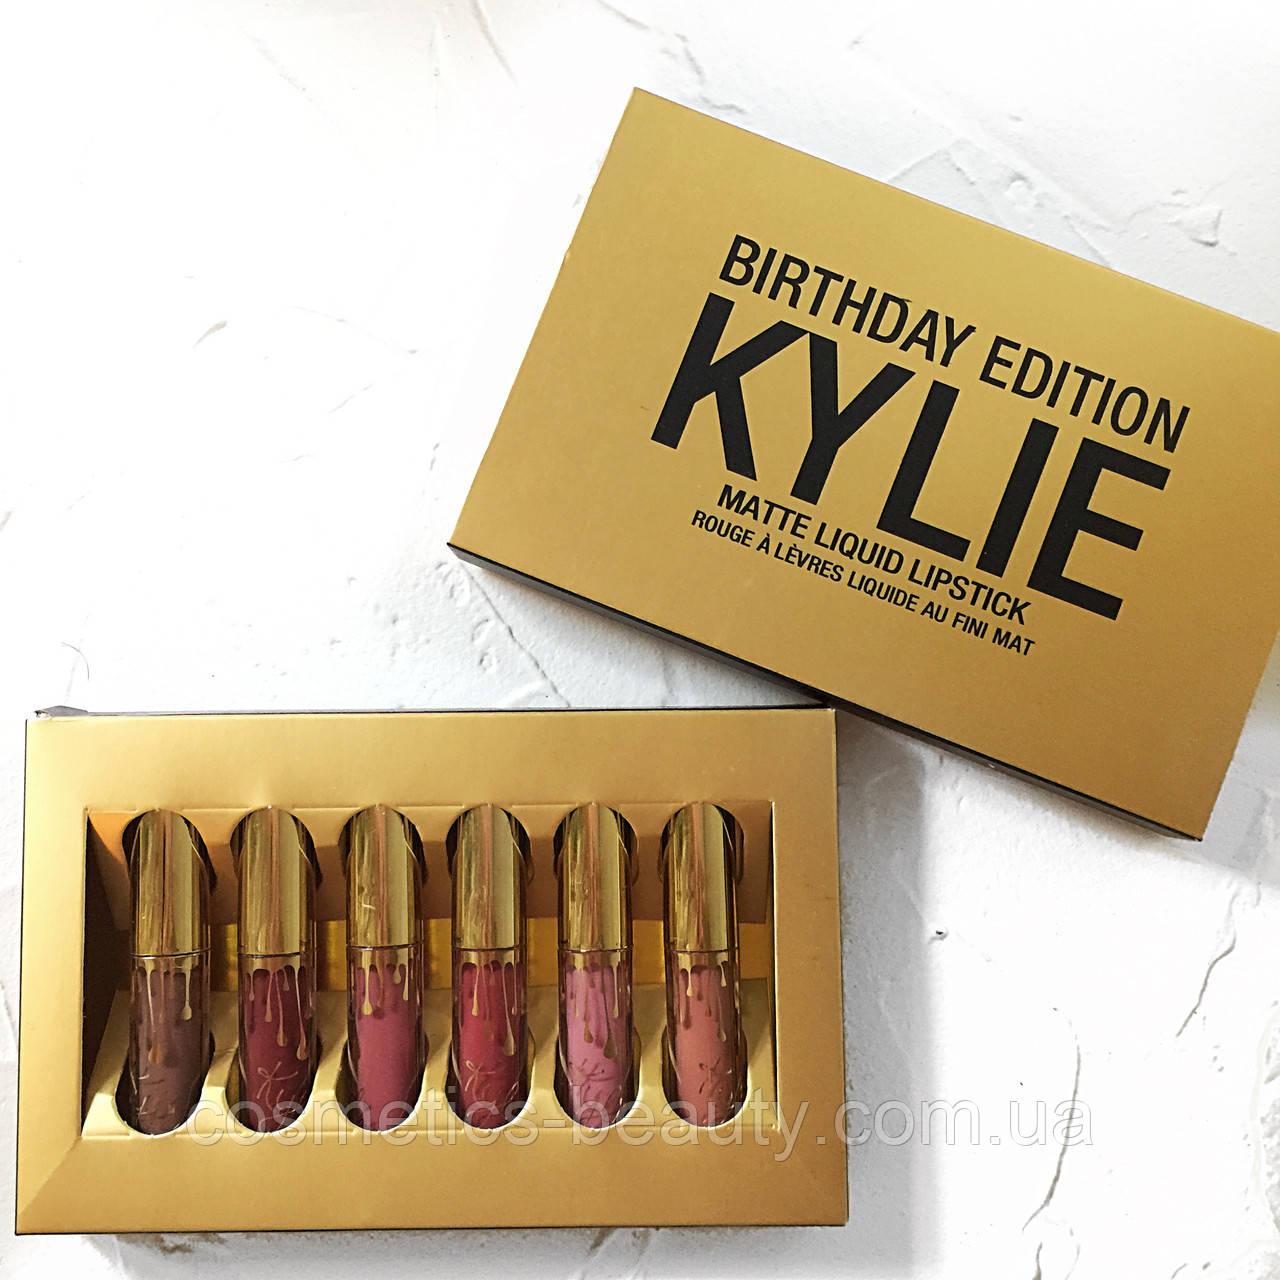 Матові помади Kylie Birthday Edition (репліка).